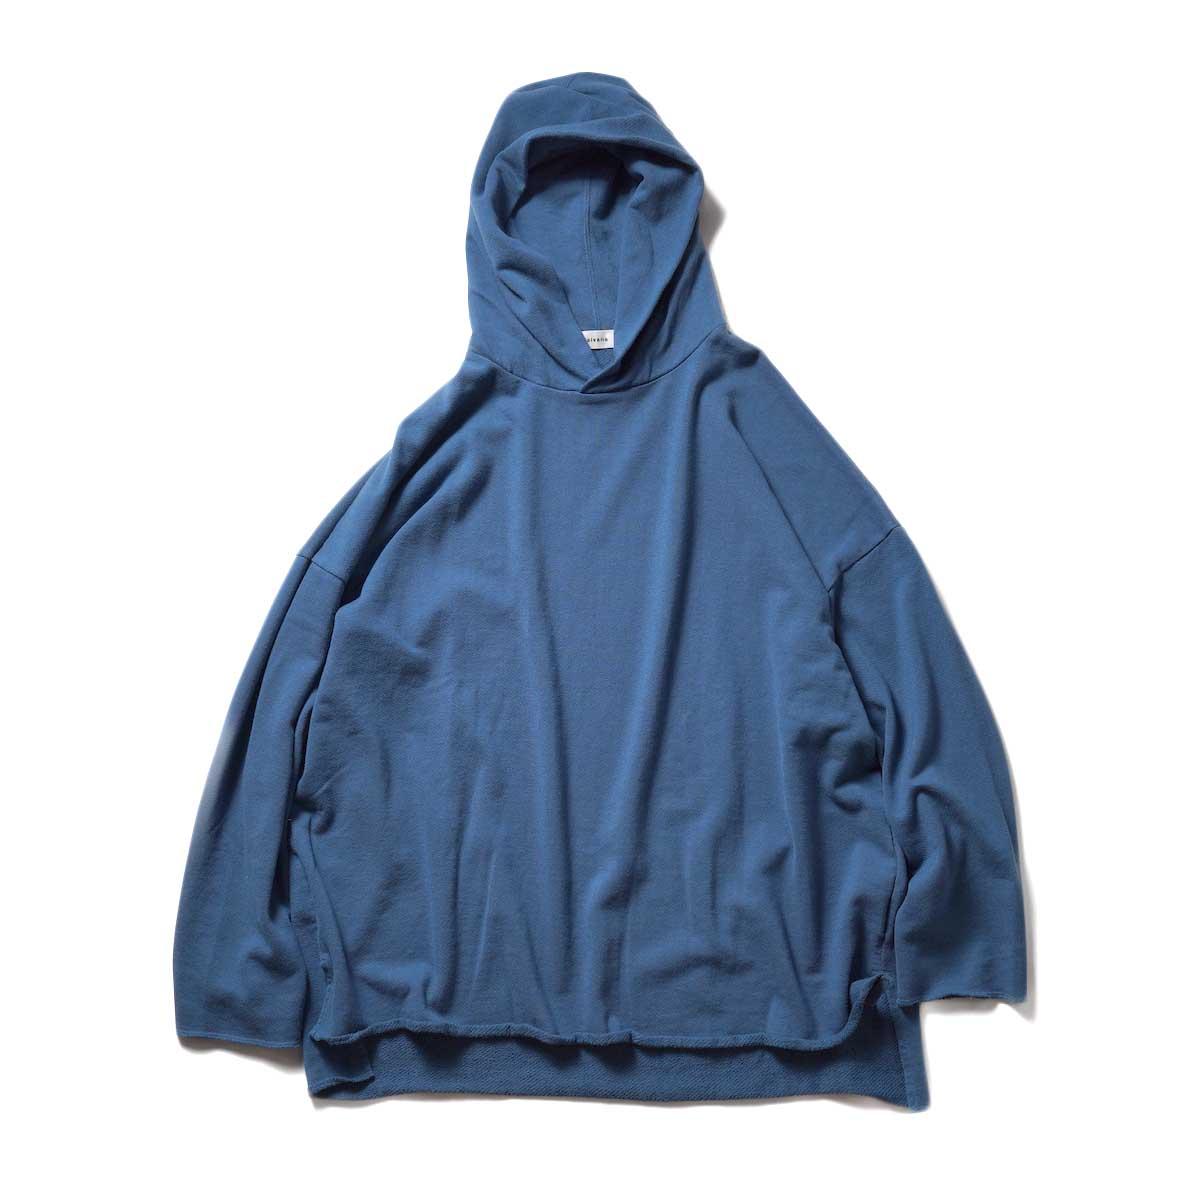 alvana / Ultimate Cut Off Parka (Smoke Blue)